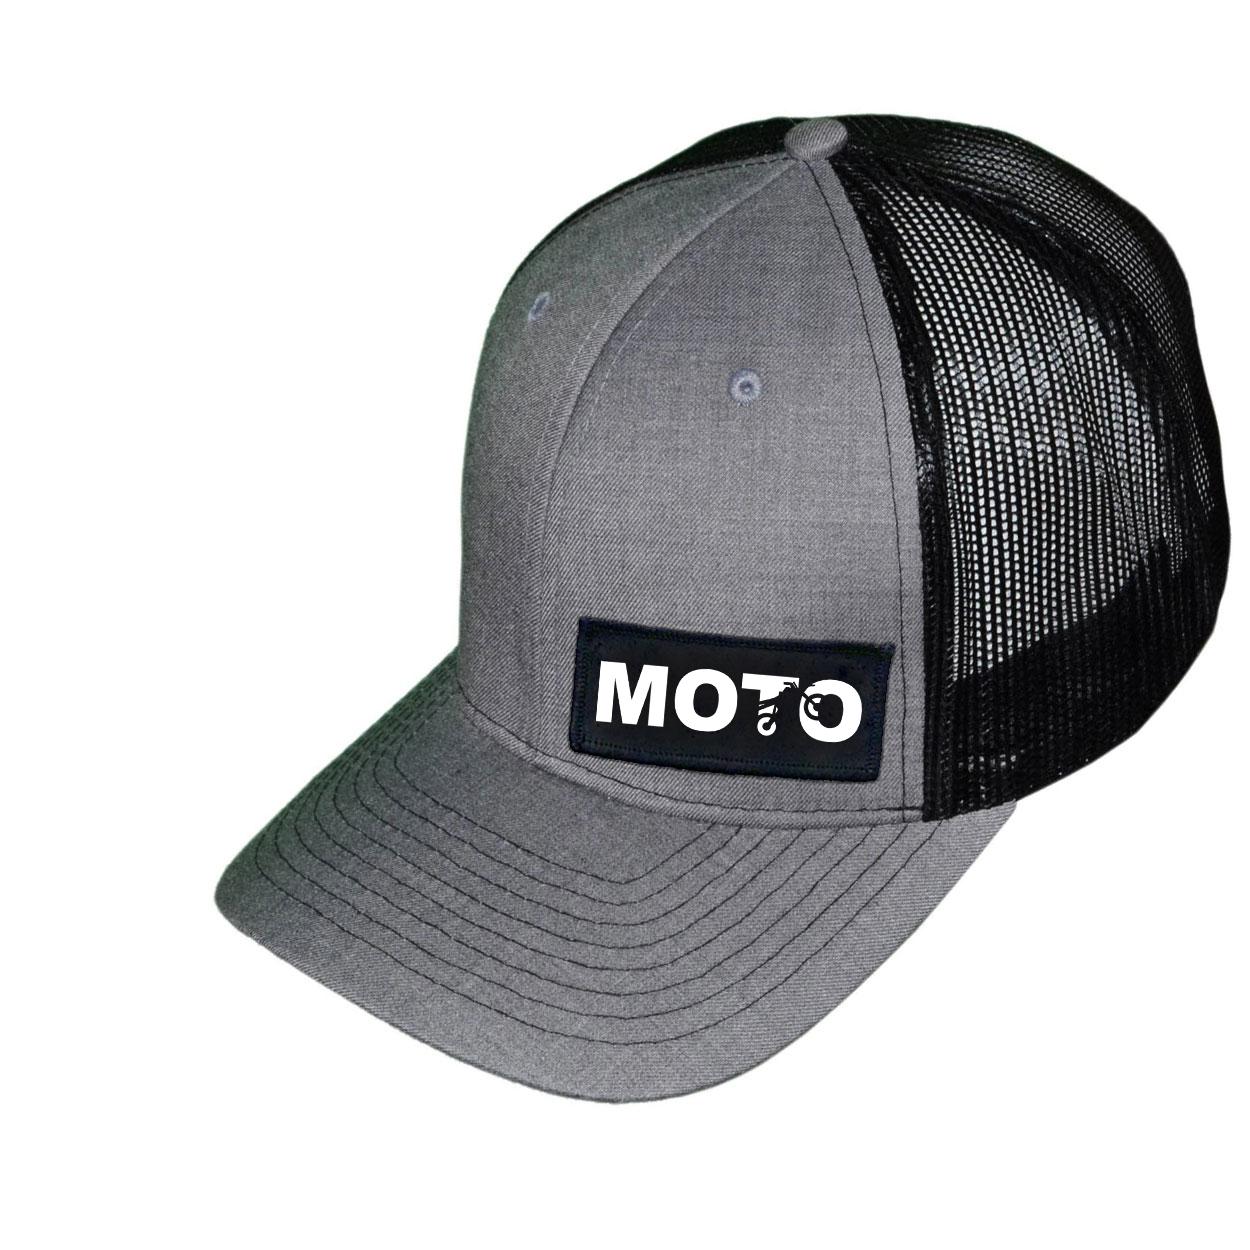 Moto Wheelie Logo Night Out Woven Patch Snapback Trucker Hat Heather Gray/Black (White Logo)